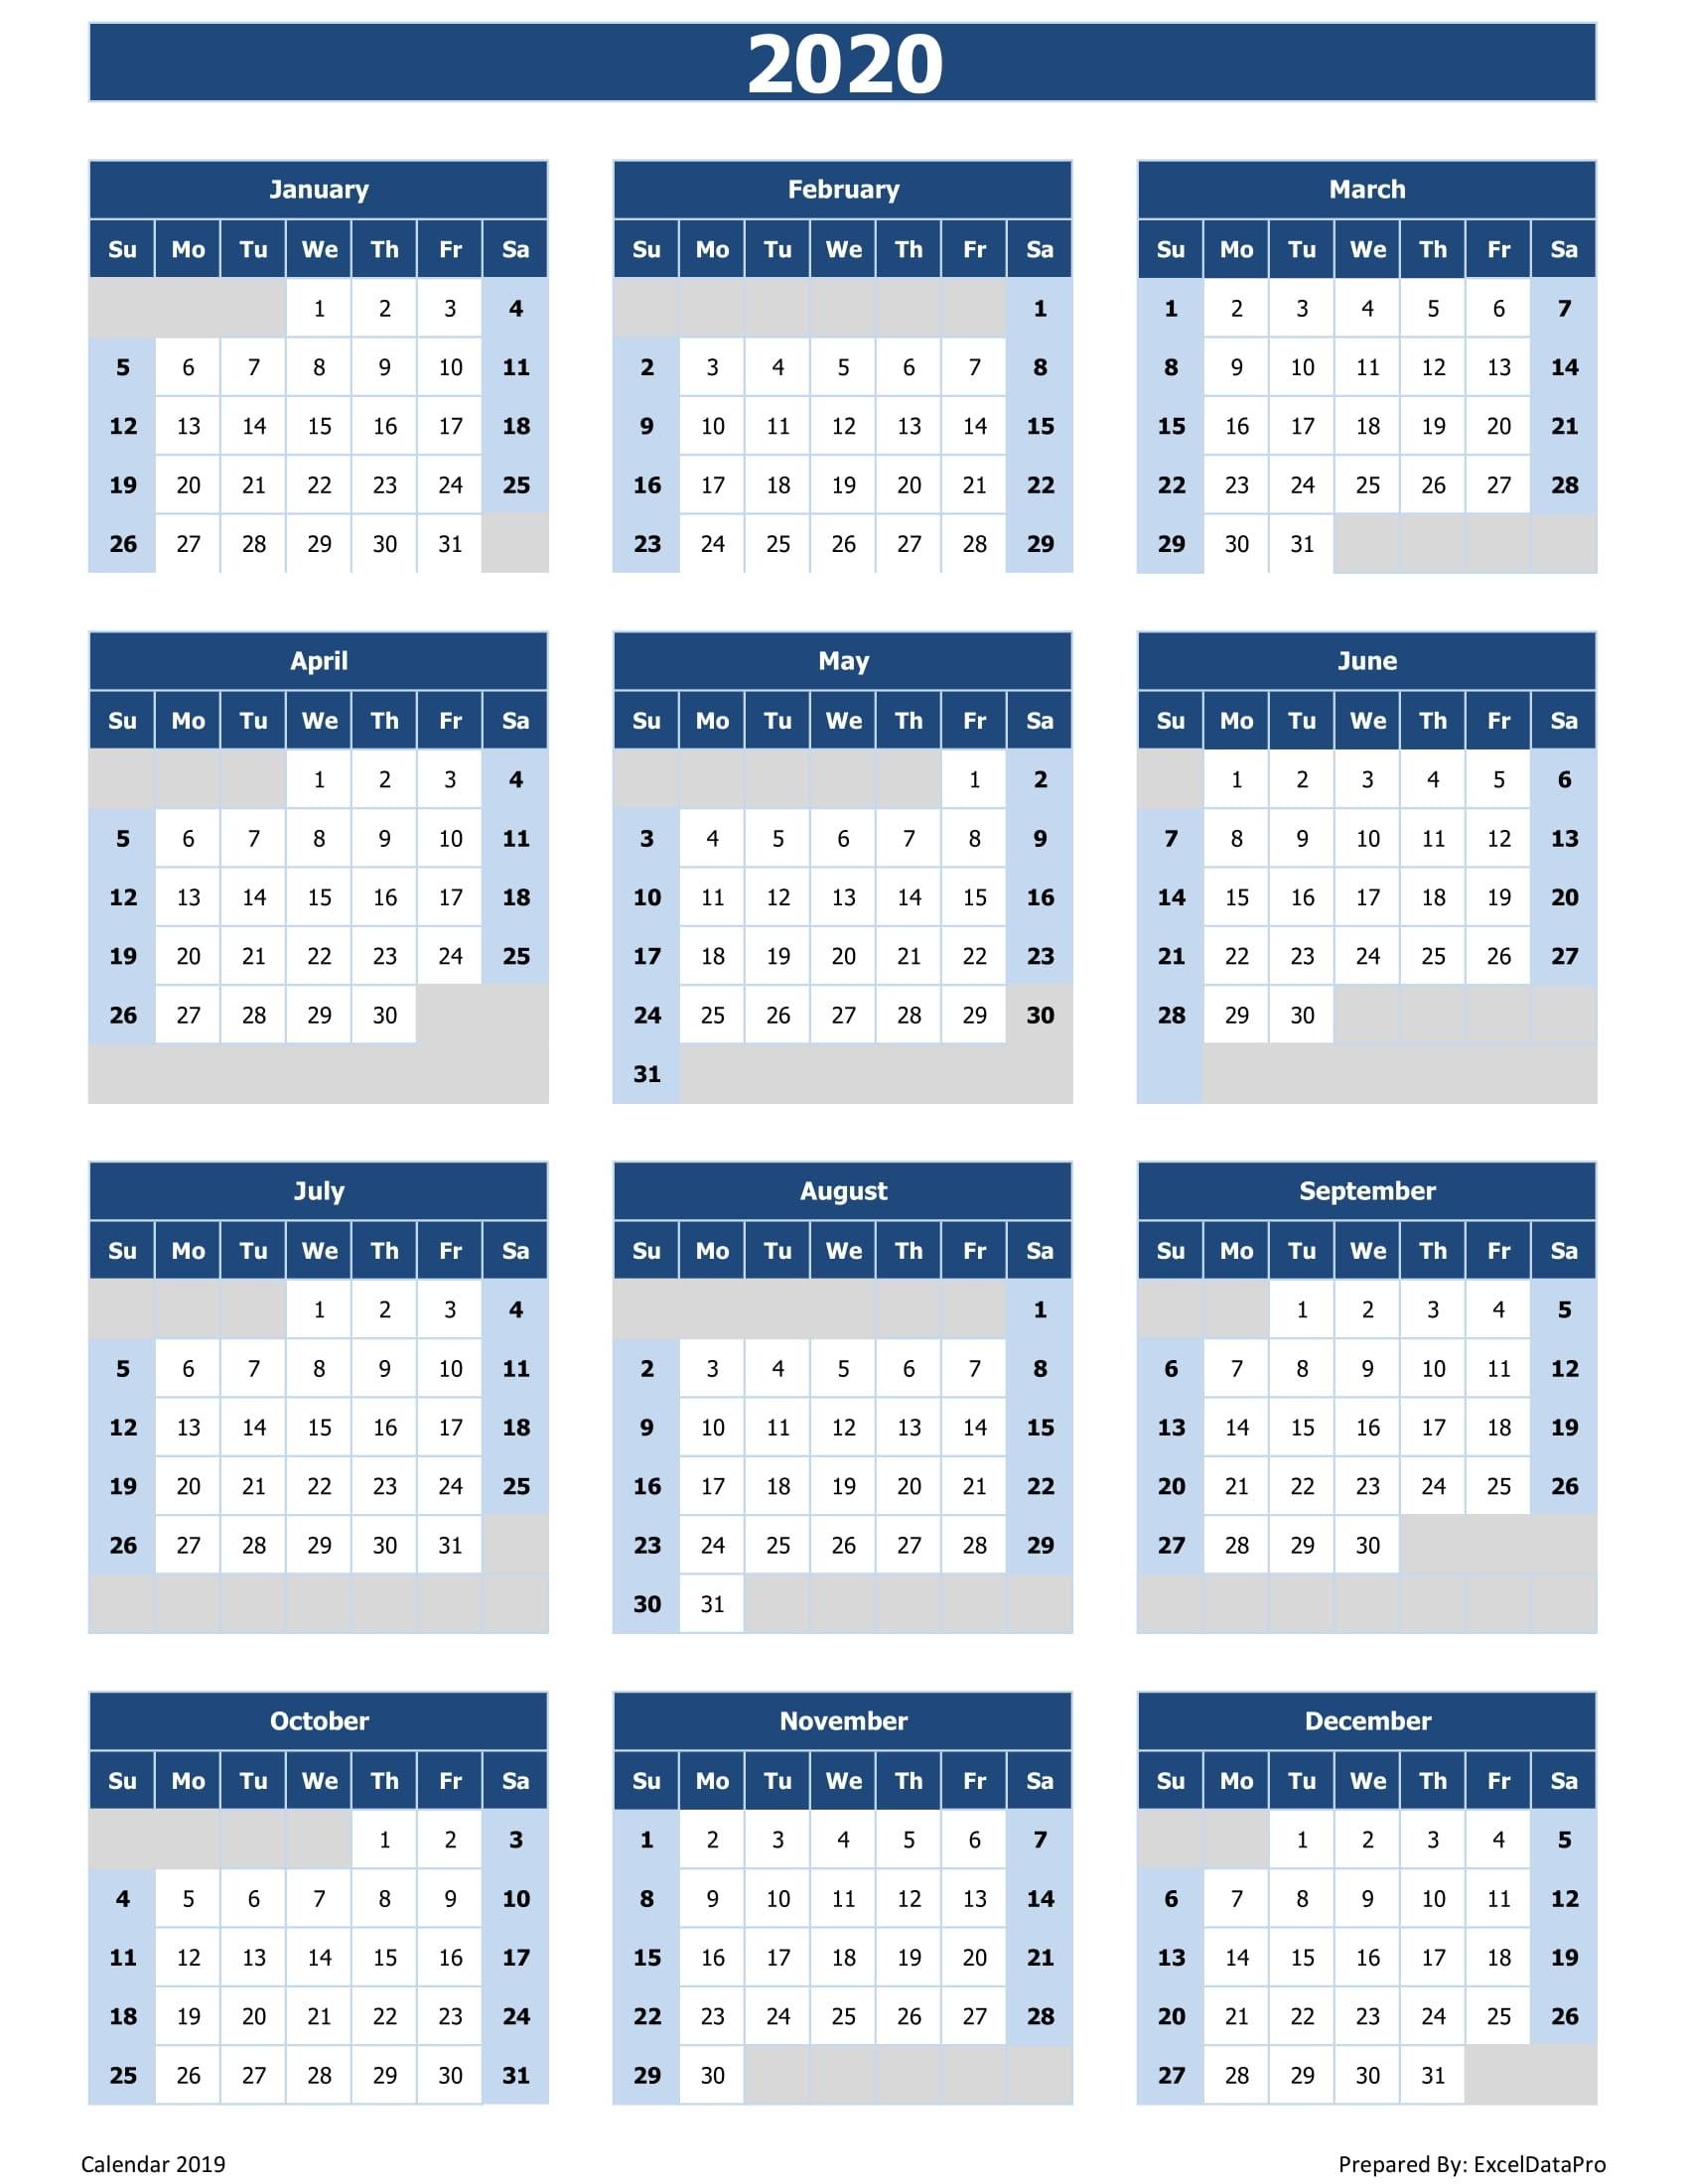 2020 Calendar Excel Templates, Printable Pdfs & Images - Exceldatapro_2020 Calendar Blank Excel